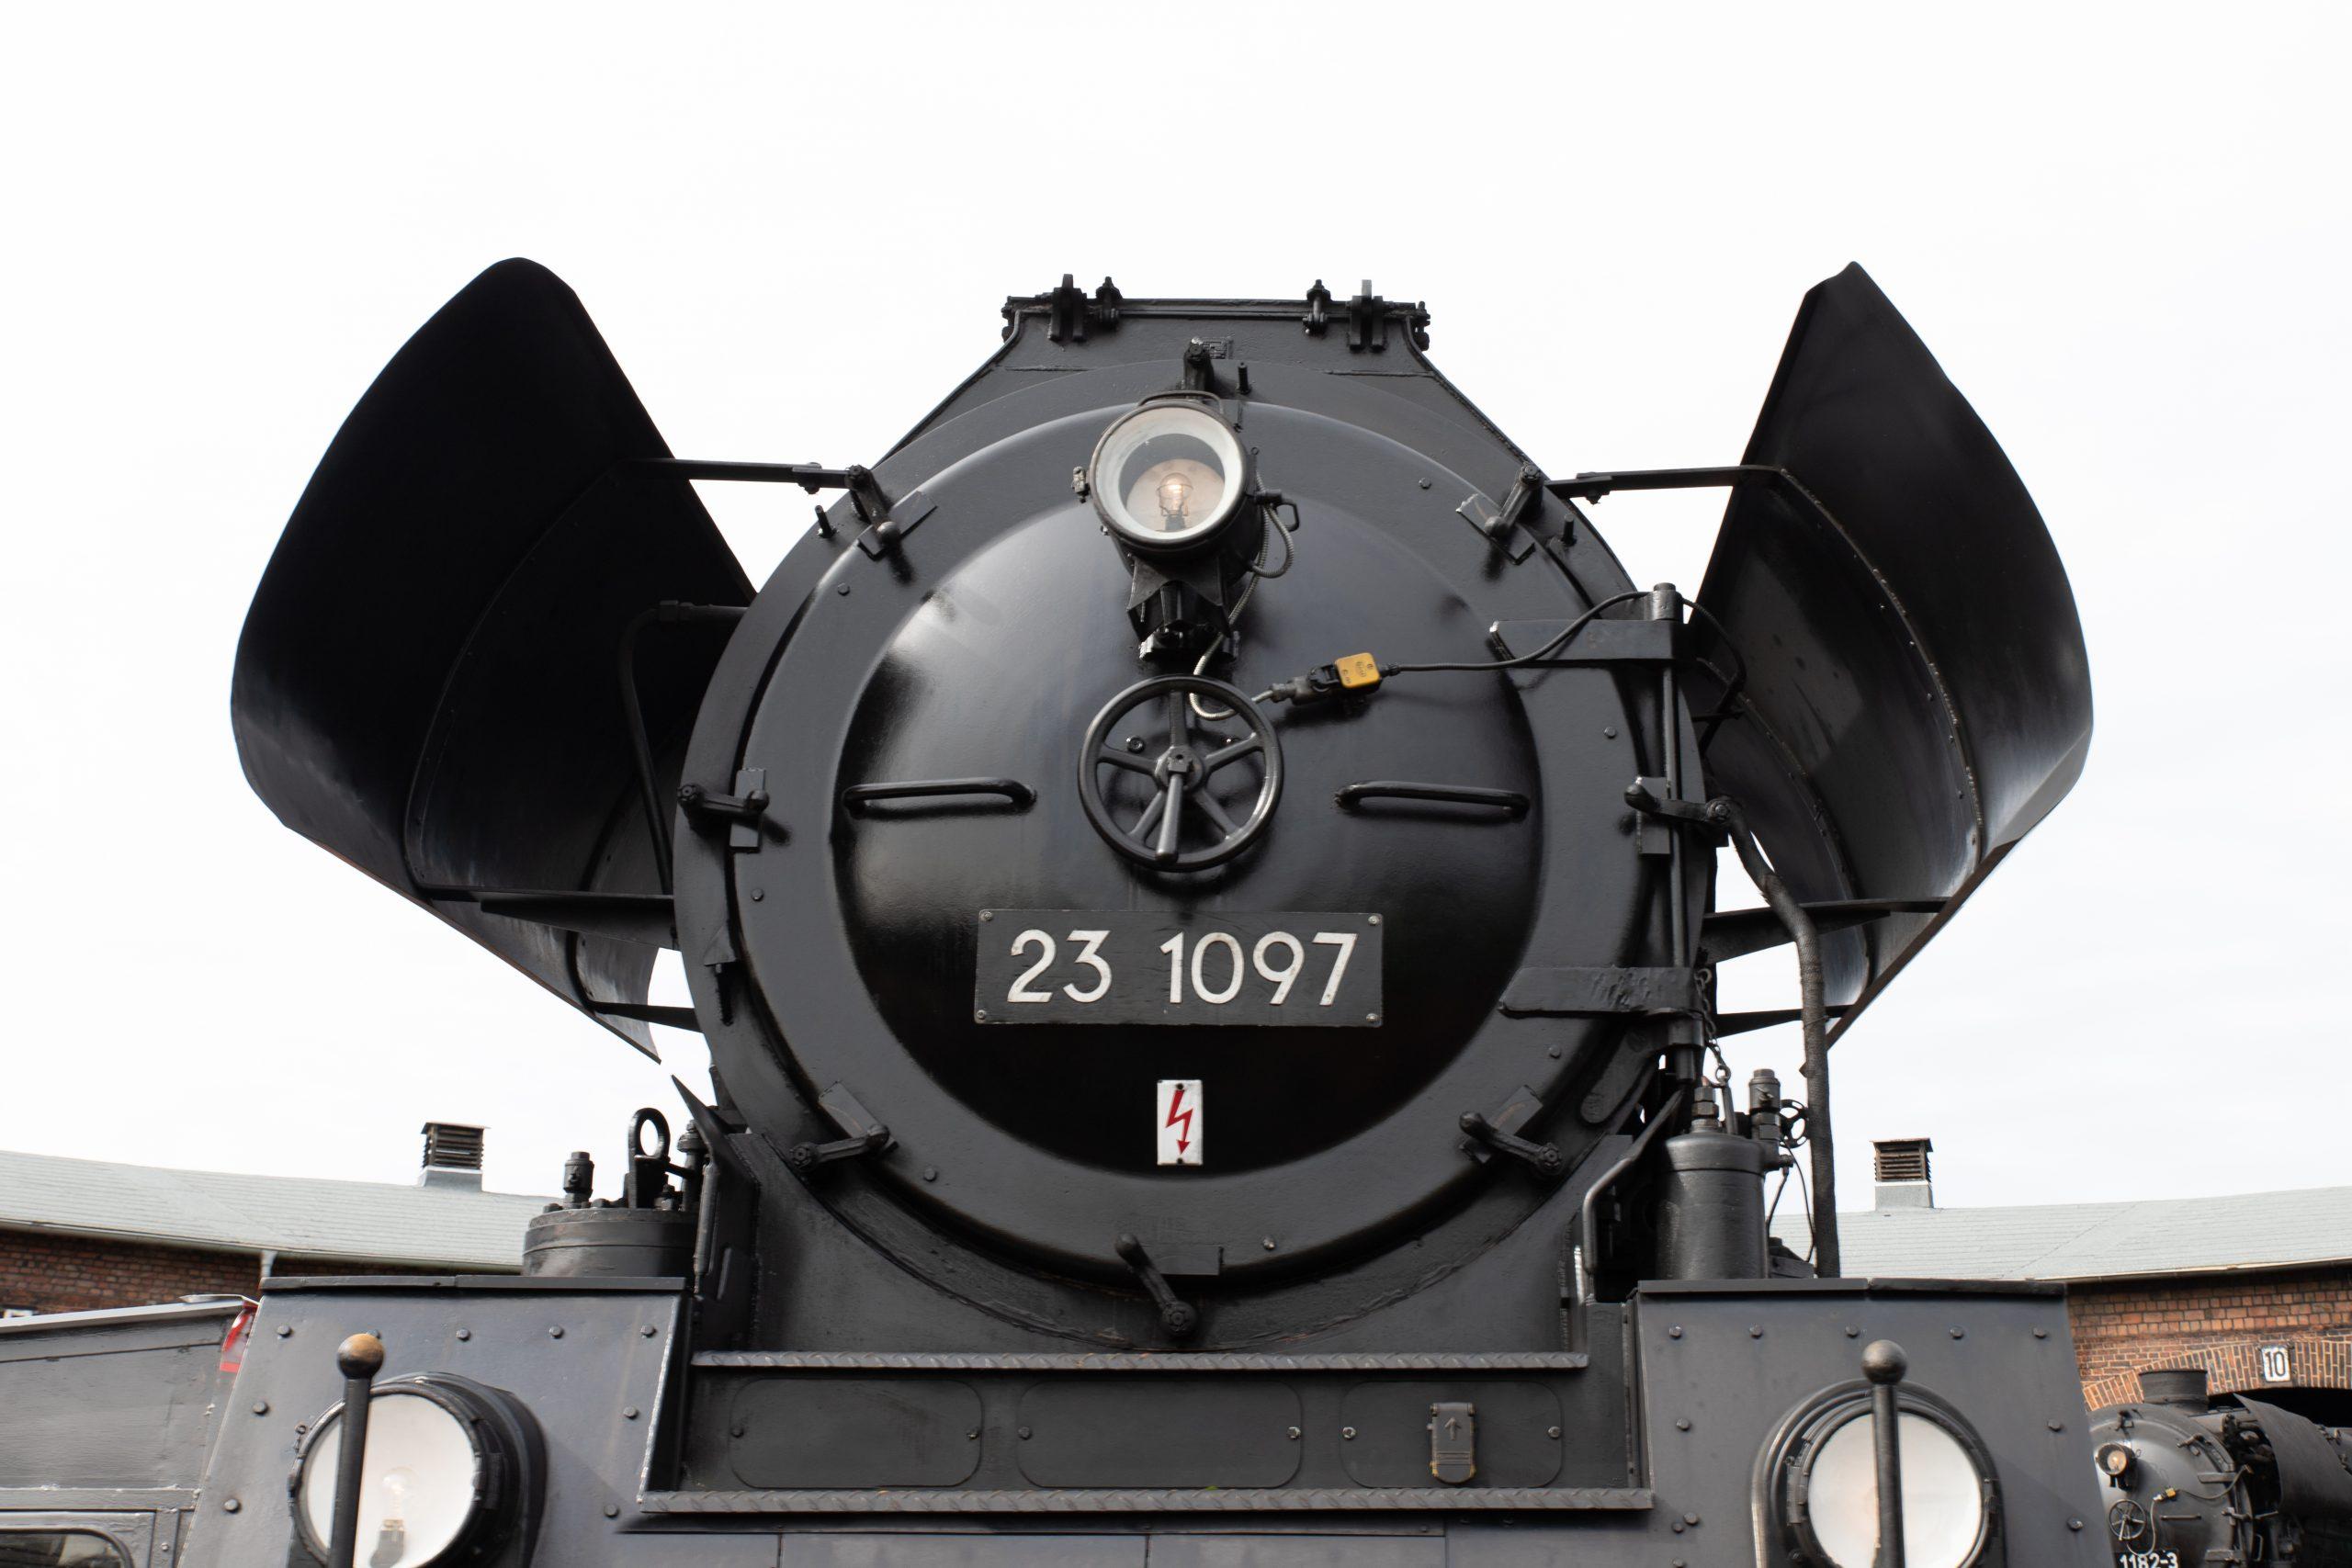 ©Foto: Denis Herwig | railmen | 2020 | Lokschuppen-Stassfurt